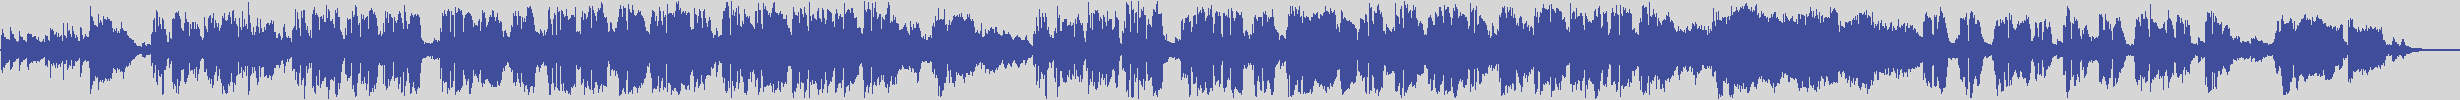 gold_hit_records [GHR003] Lucas Castro - Habrà Que Volar [Radio Edit] audio wave form